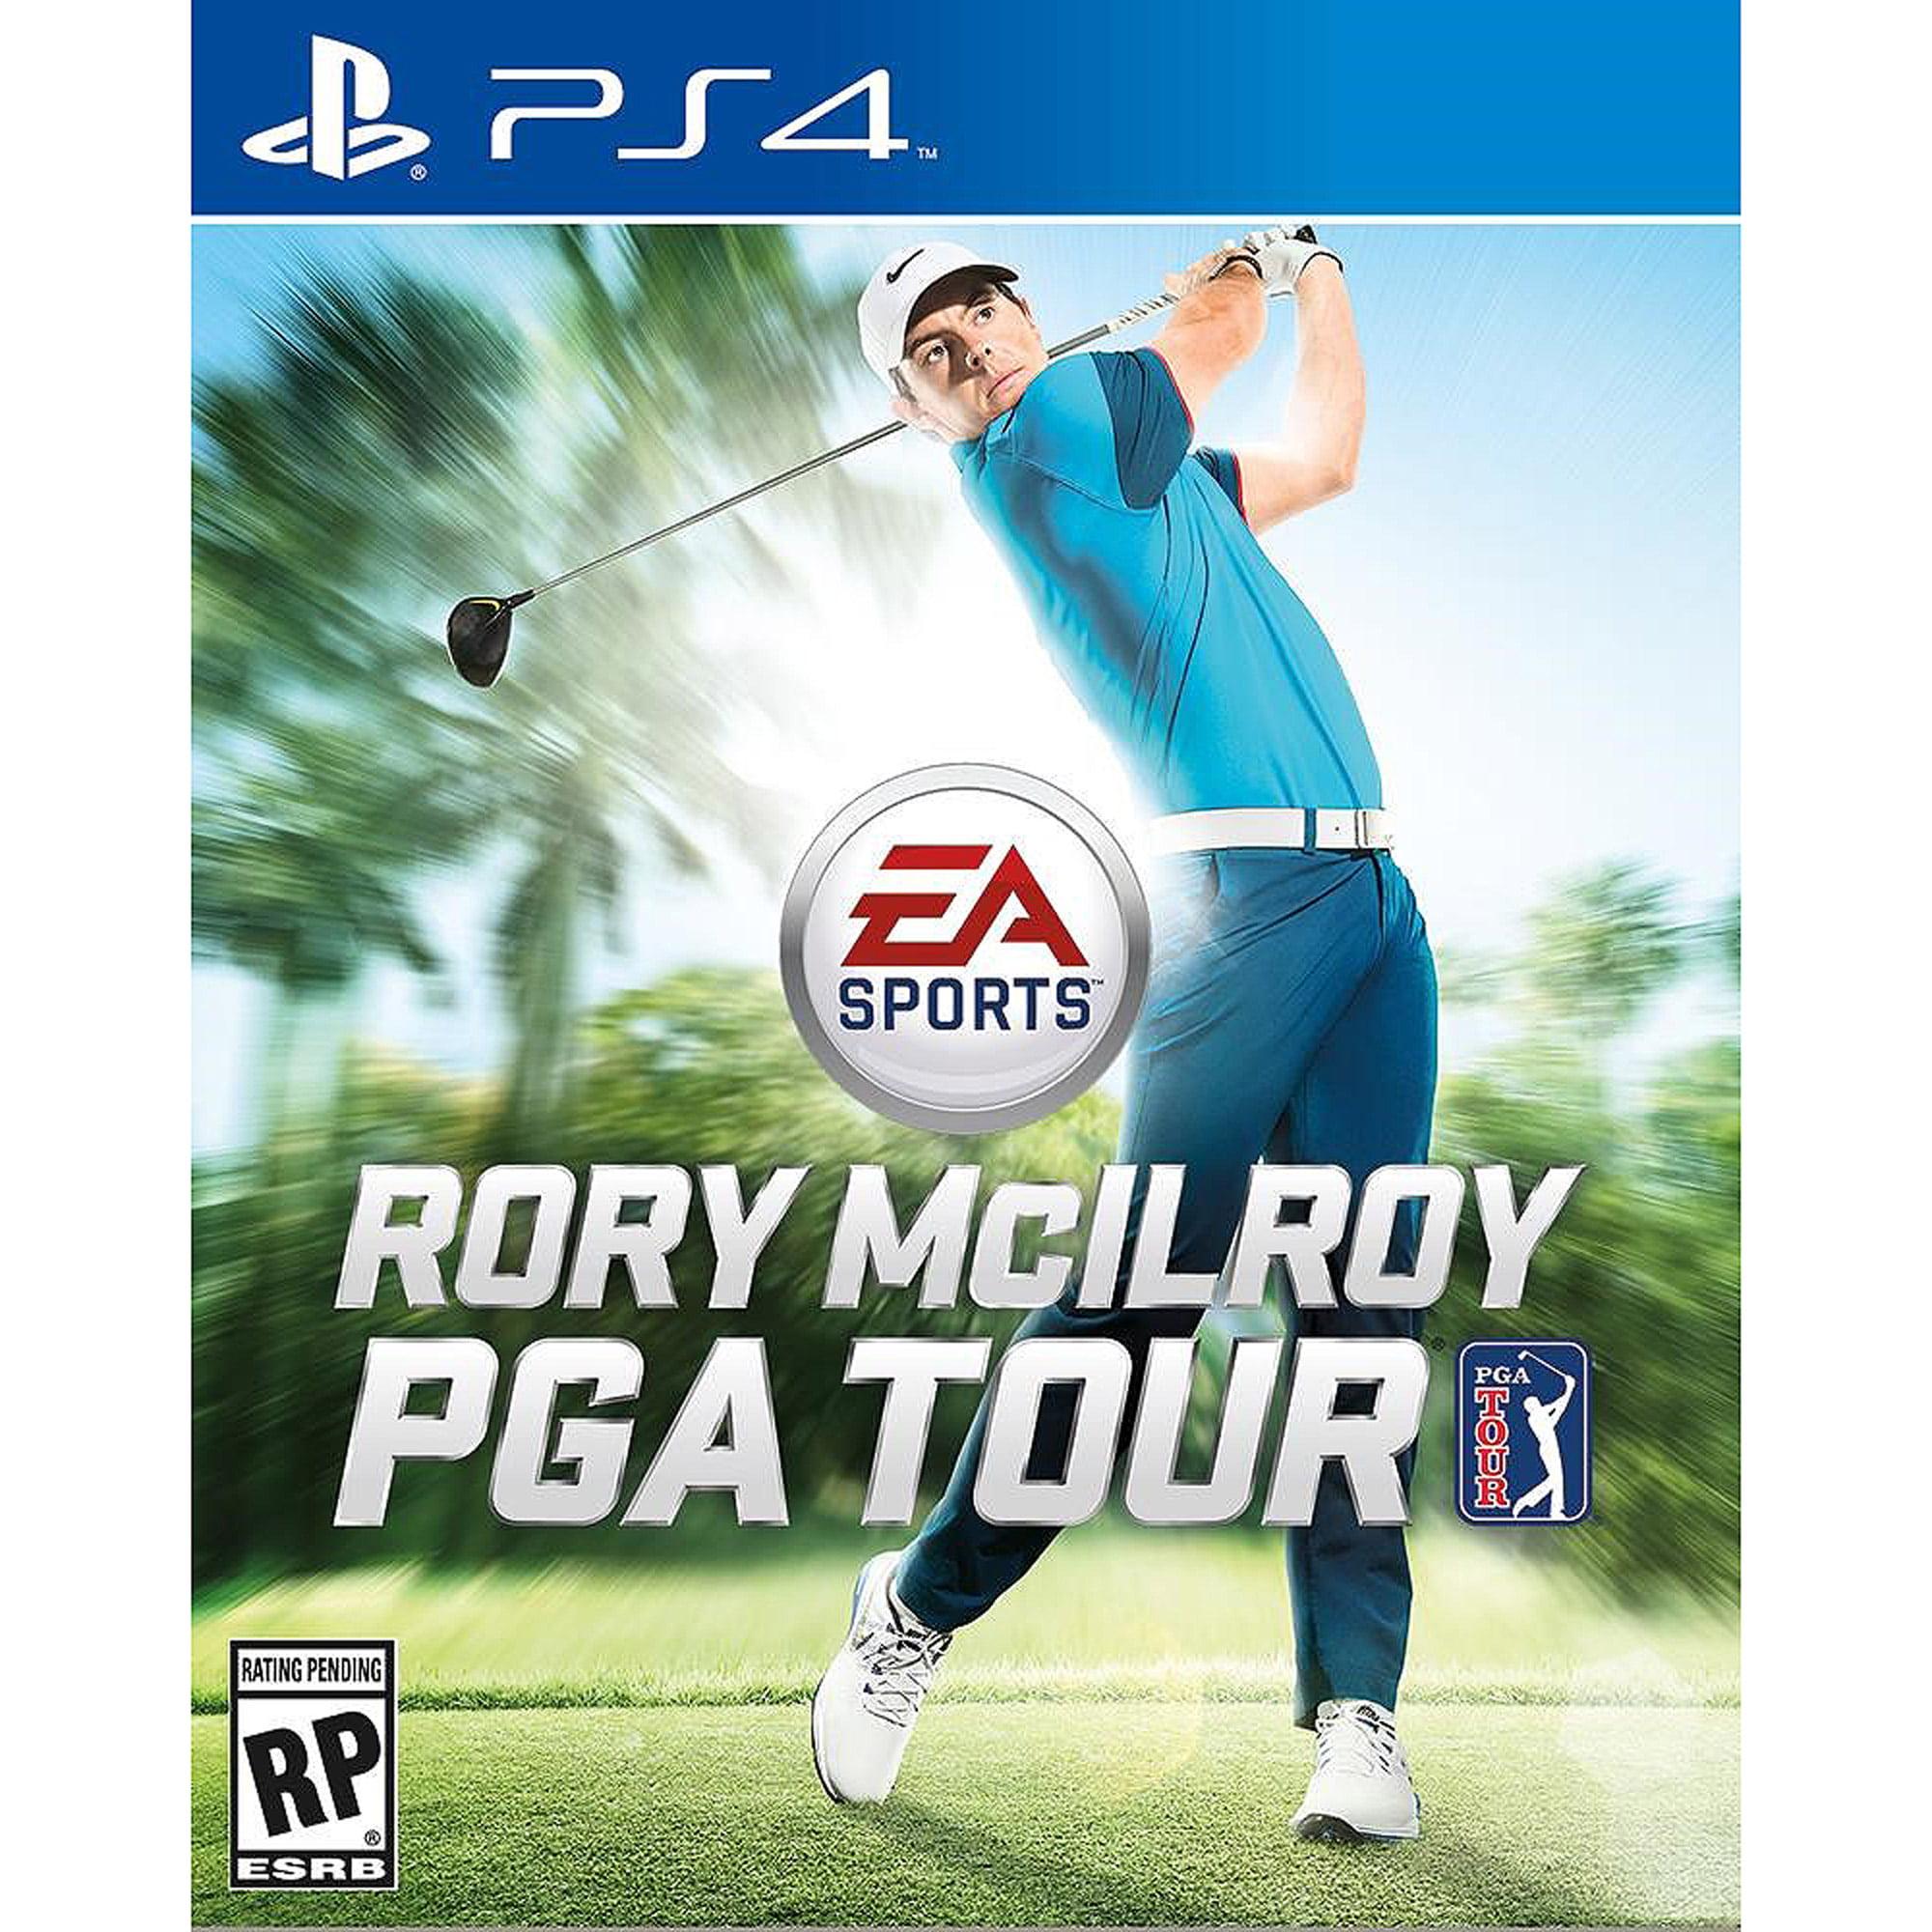 EA Sports Rory McIlroy PGA Tour (Playstation 4) by Electronic Arts Tiburon